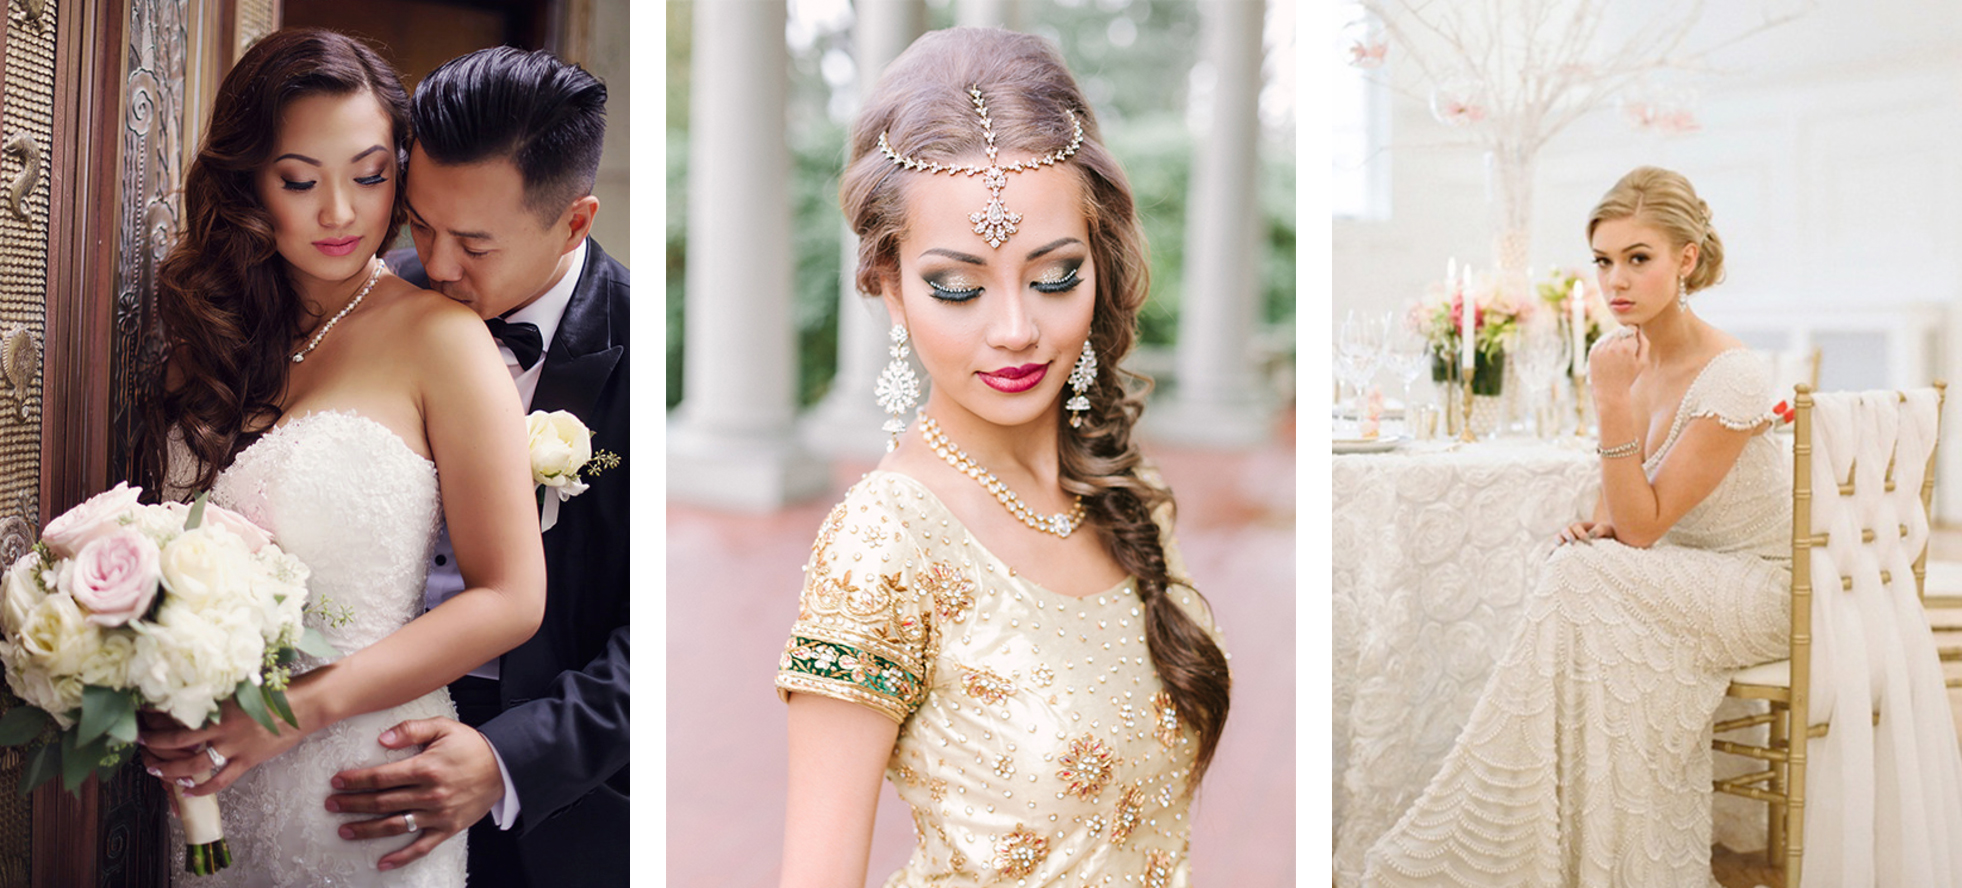 tianna-tran-vancouver-wedding-makeup-artist.jpg